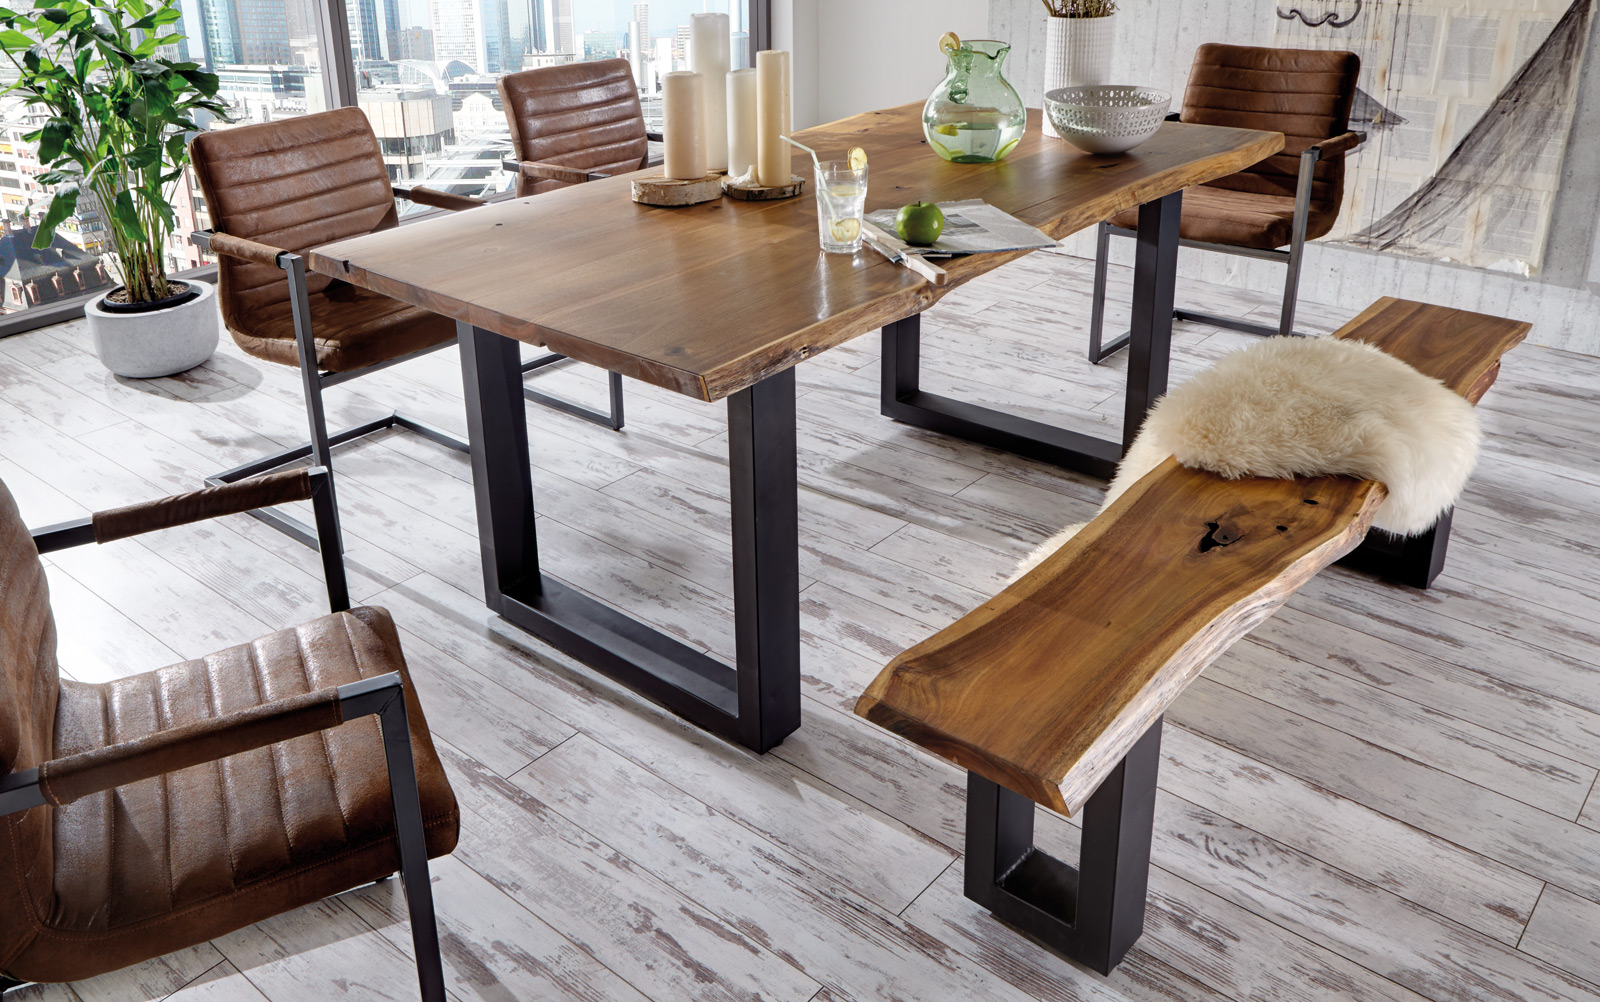 Sam massivholz akazie tisch 180 cm quentin g nstig for Tisch massivholz